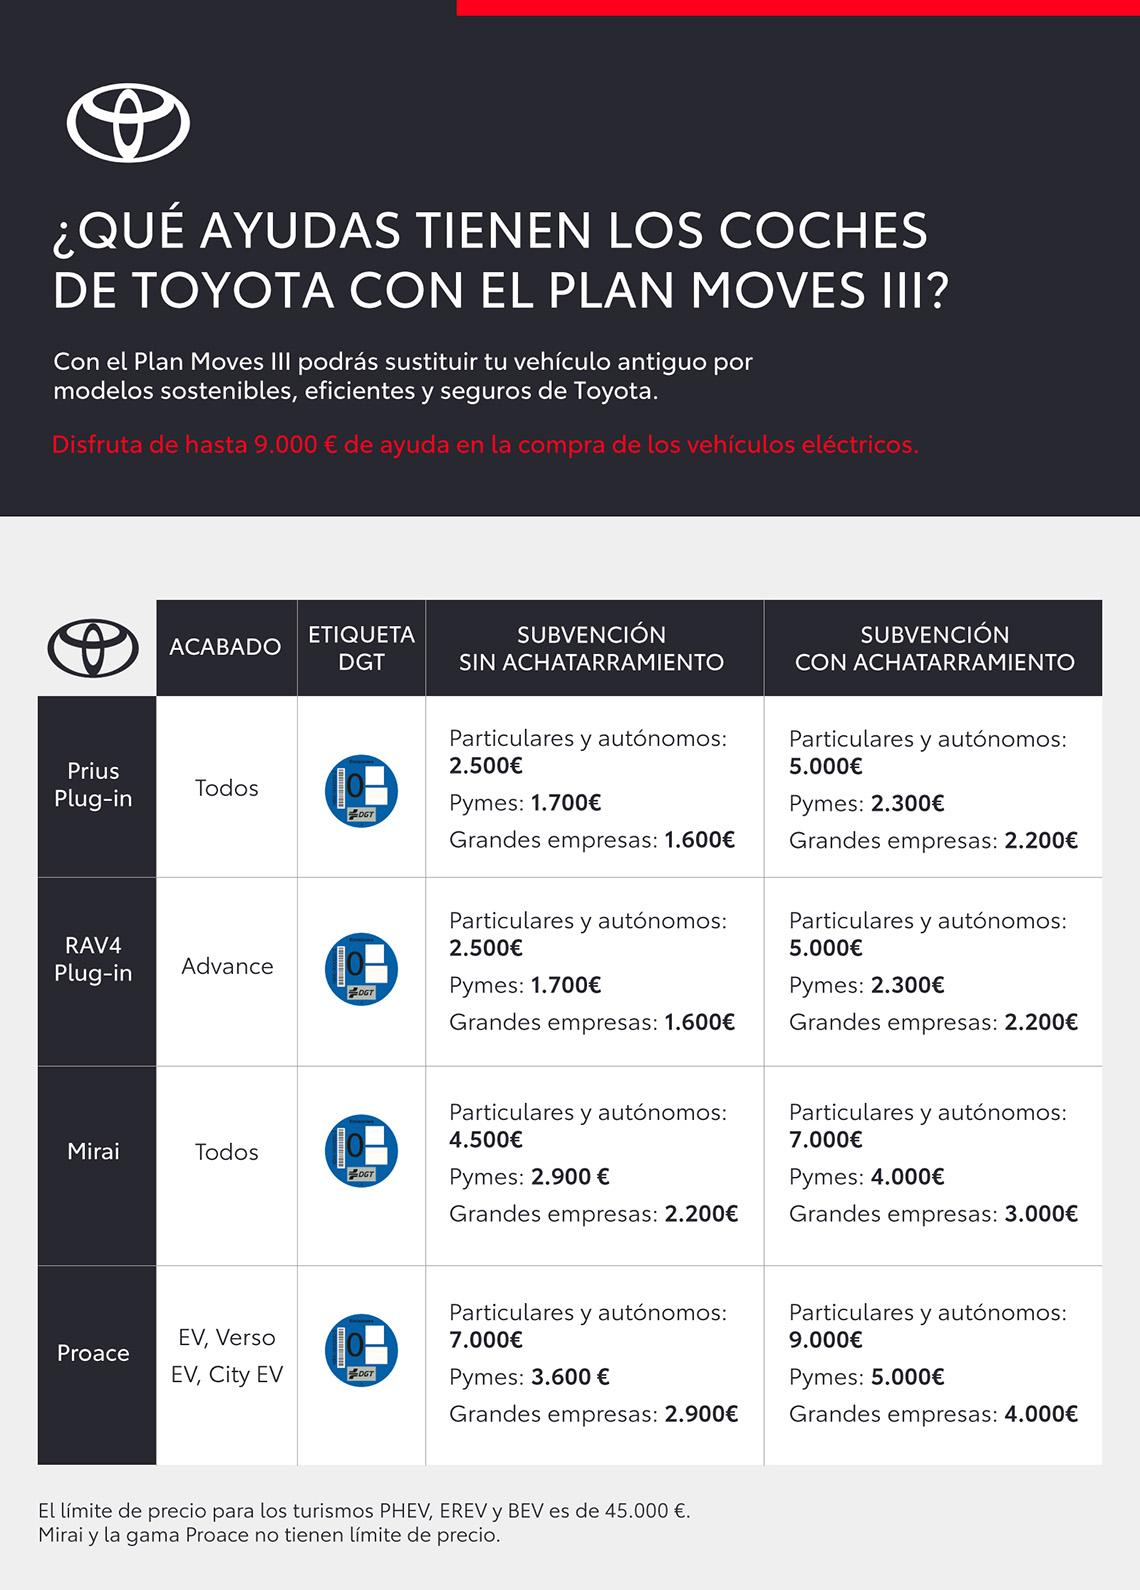 INFG_Plan Moves III